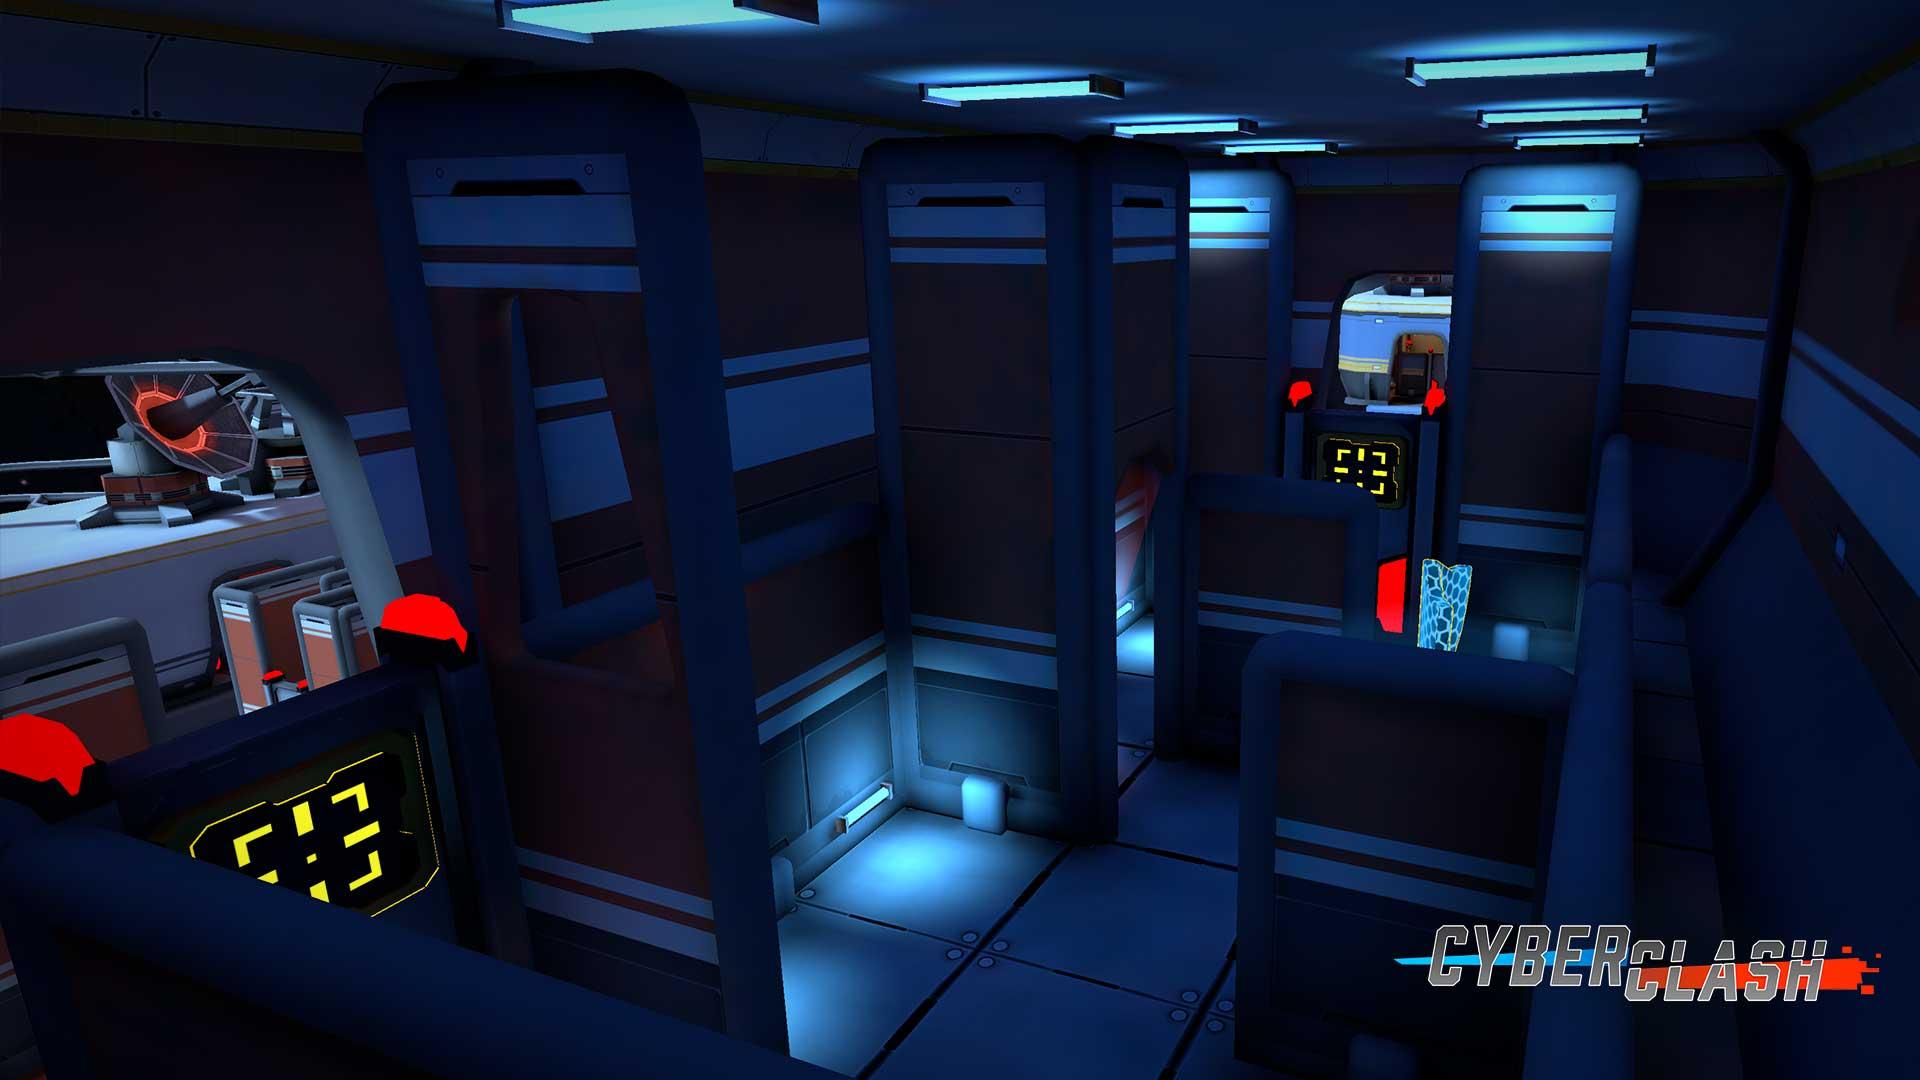 CyberClash_space3_web